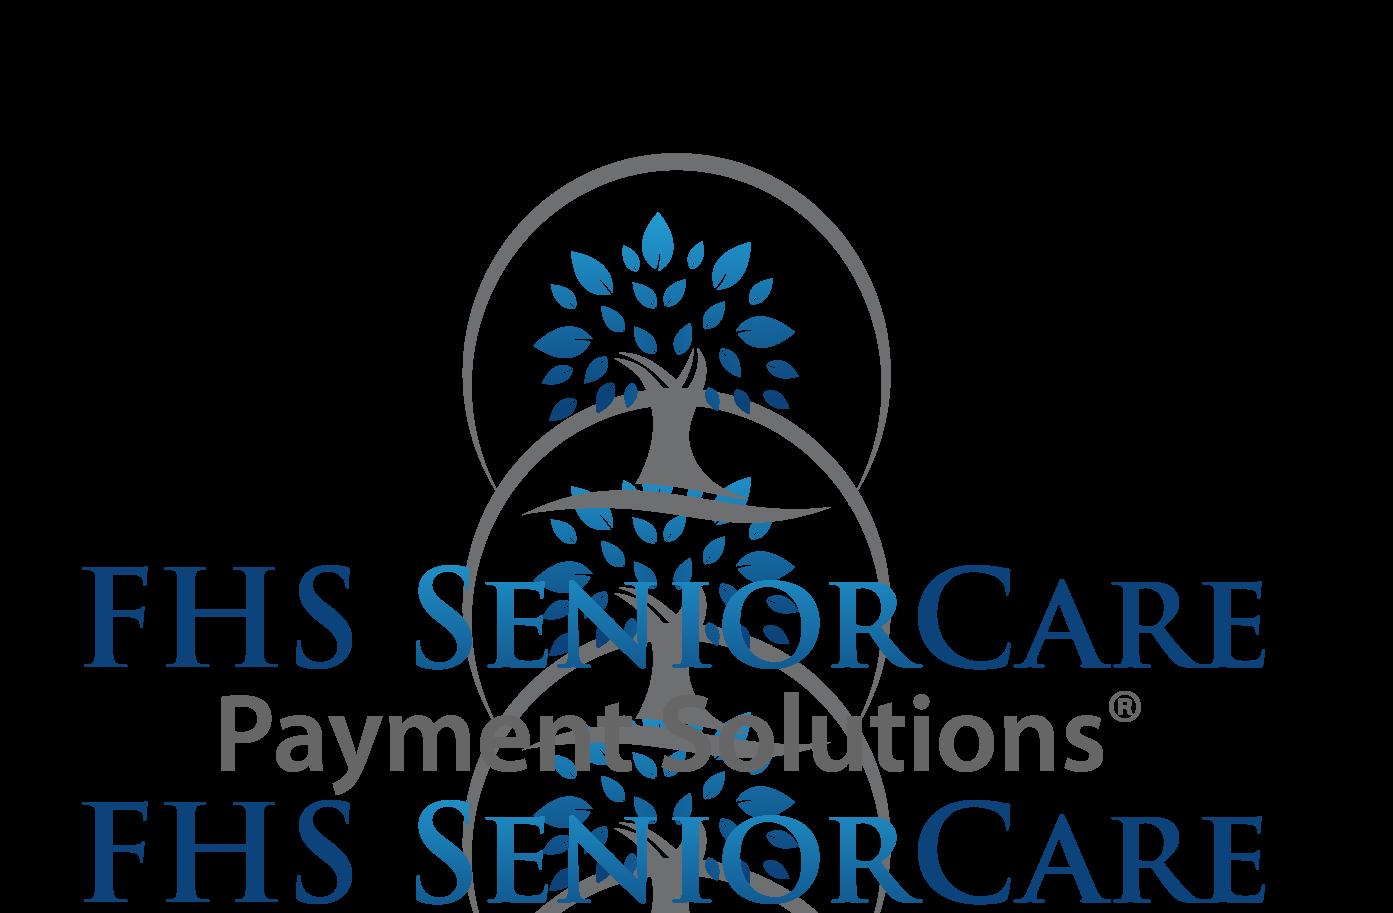 FHS SeniorCare Payment Solutions